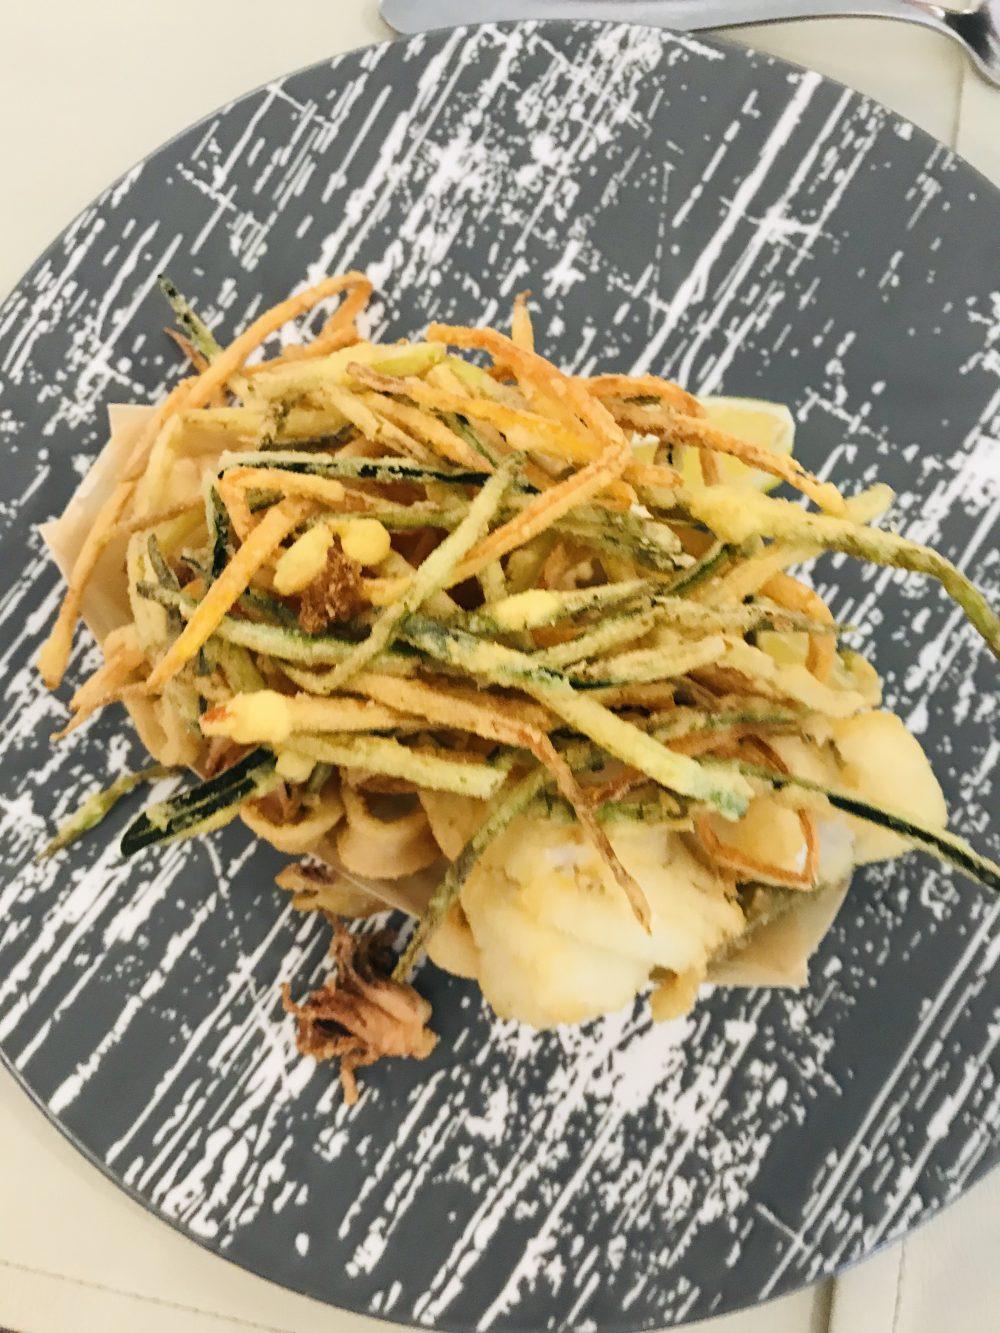 Rovy Ristorante - Baccala' e calamari, melanzane e carote